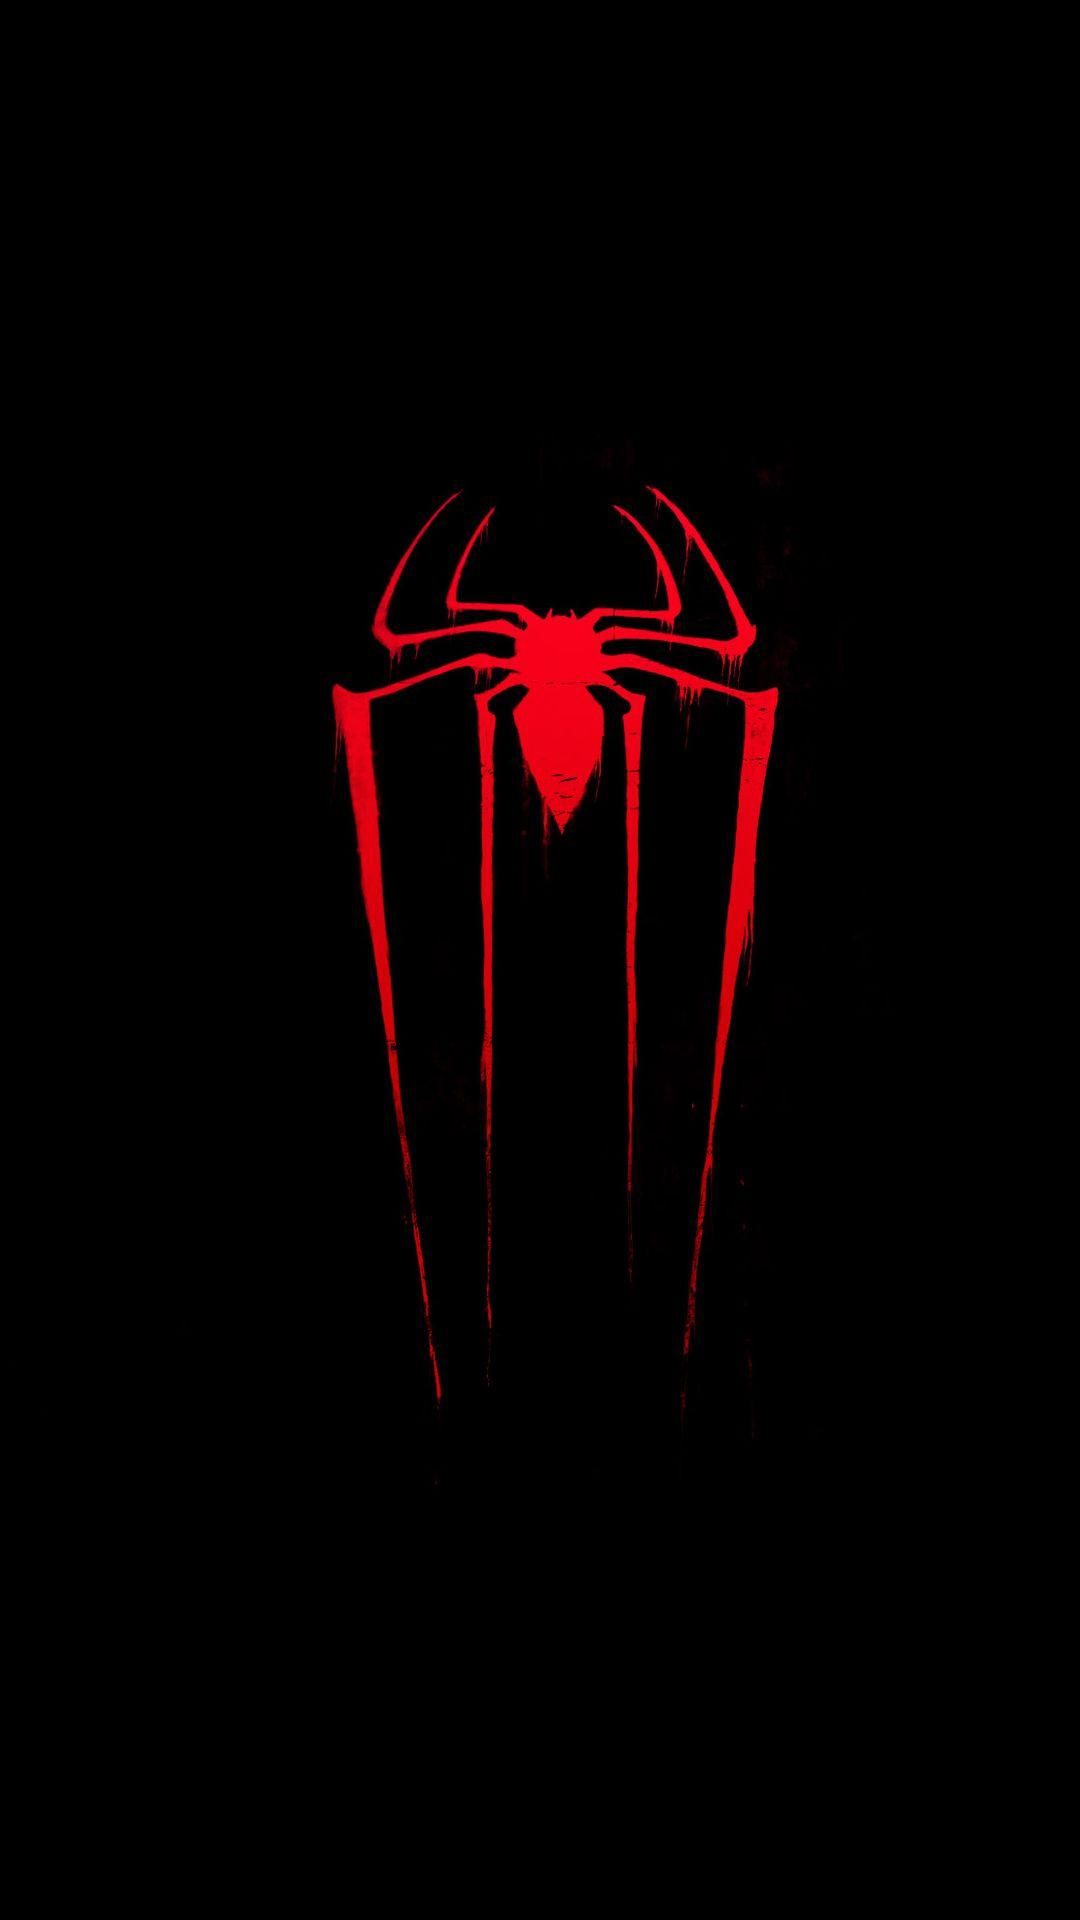 Spiderman iPhone6s Wallpaper Amazing spiderman Amazing spider 1080x1920